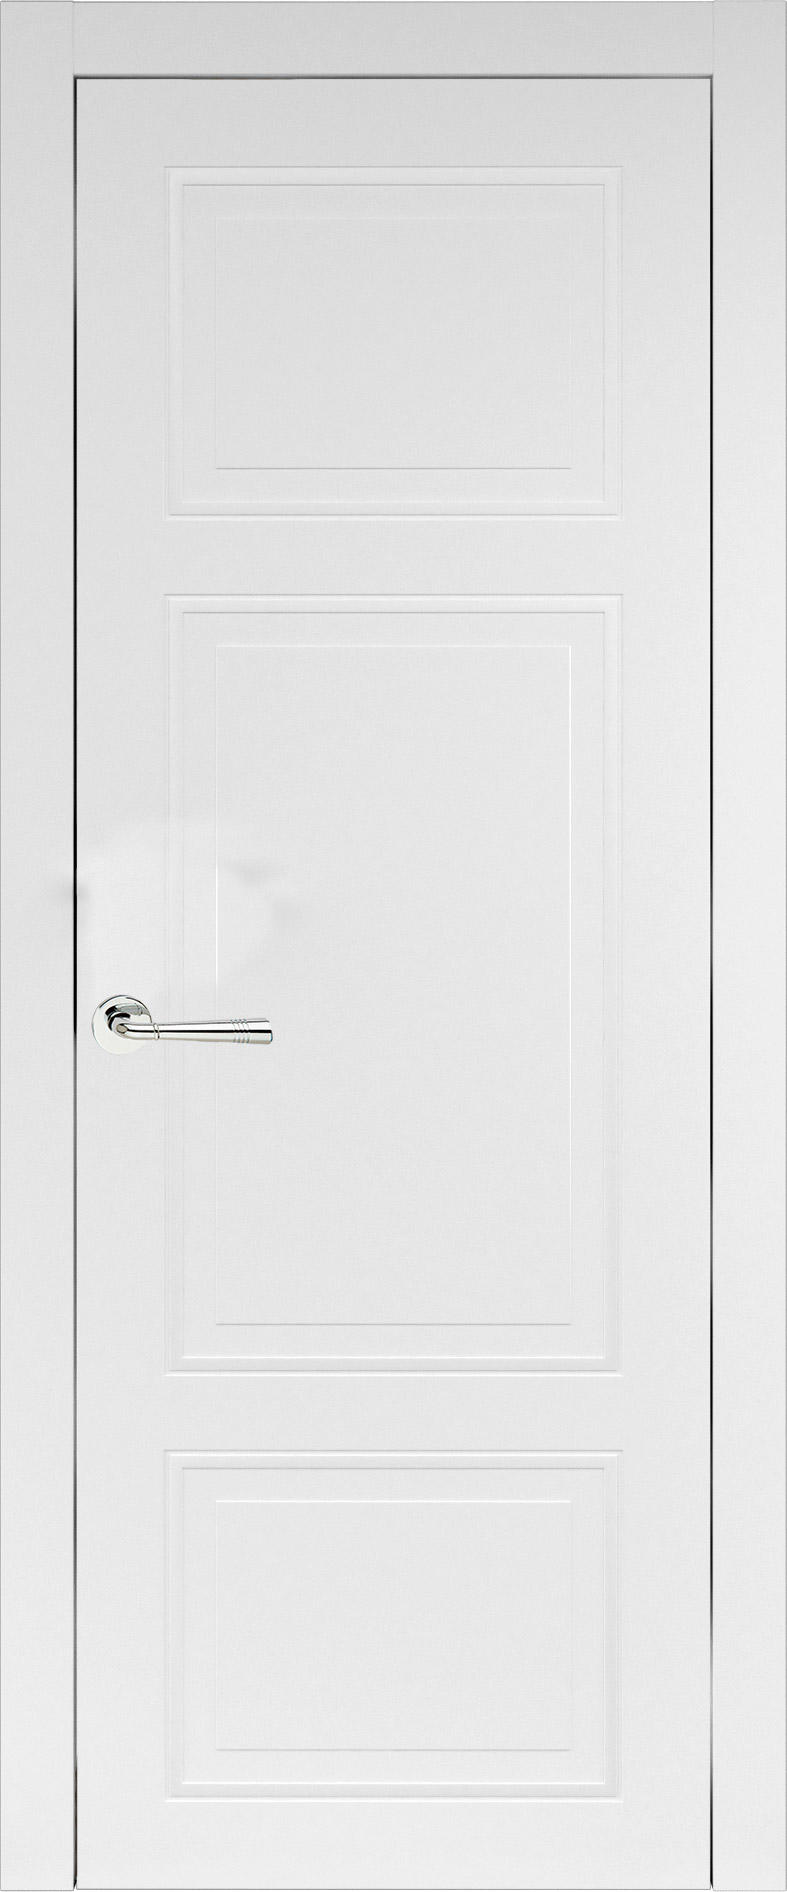 Siena Neo Classic цвет - Белая эмаль (RAL 9003) Без стекла (ДГ)